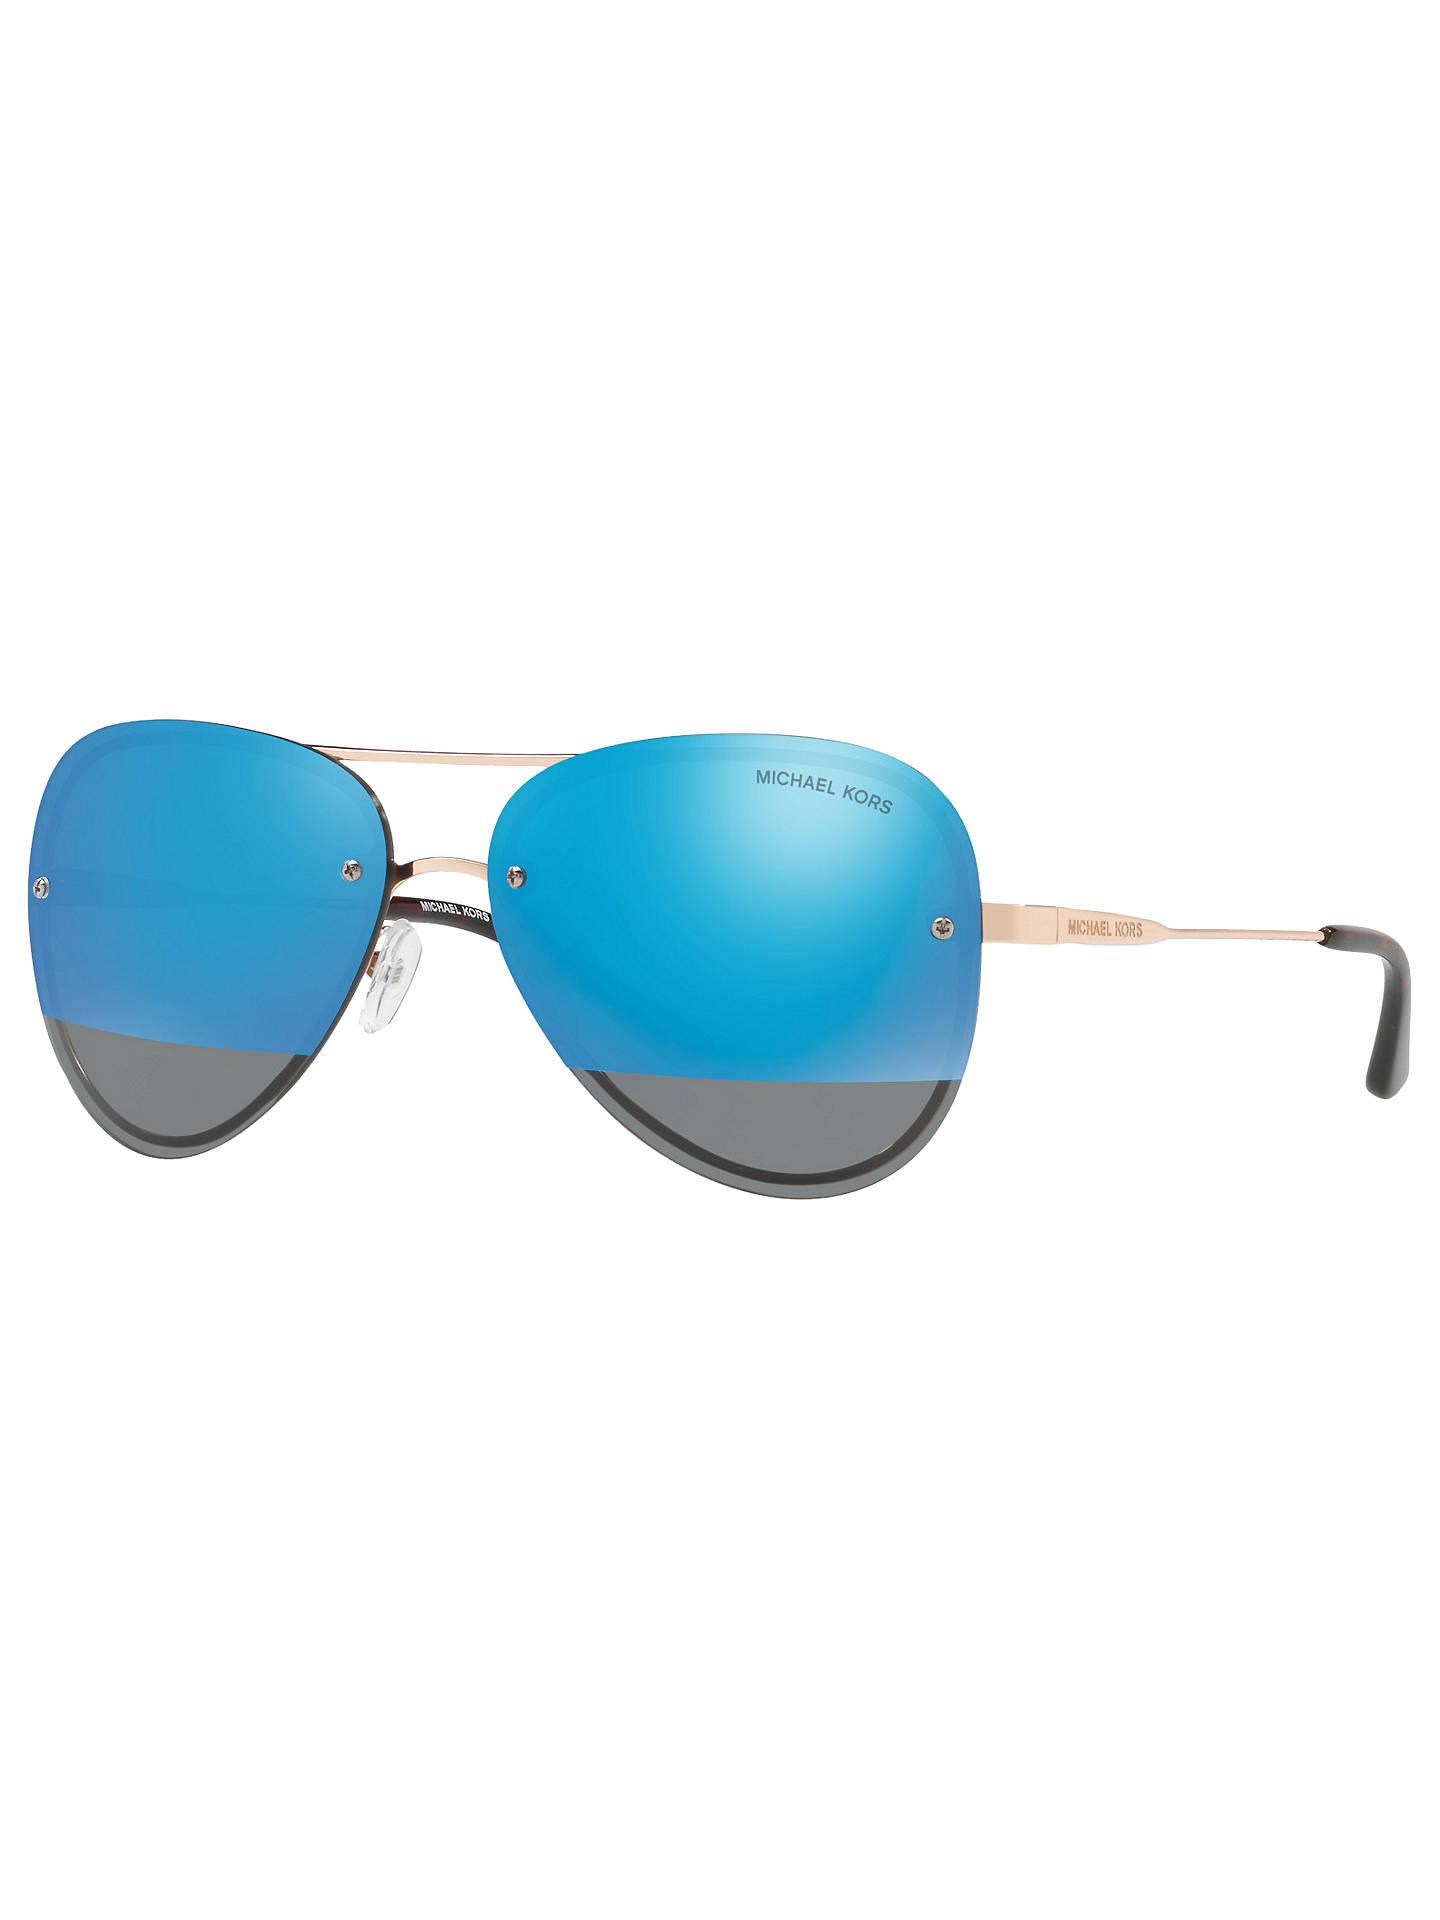 b89525f0de37 Buy Michael Kors MK1026 La Jolla Aviator Sunglasses, Rose Gold/Mirror Blue  Online at ...